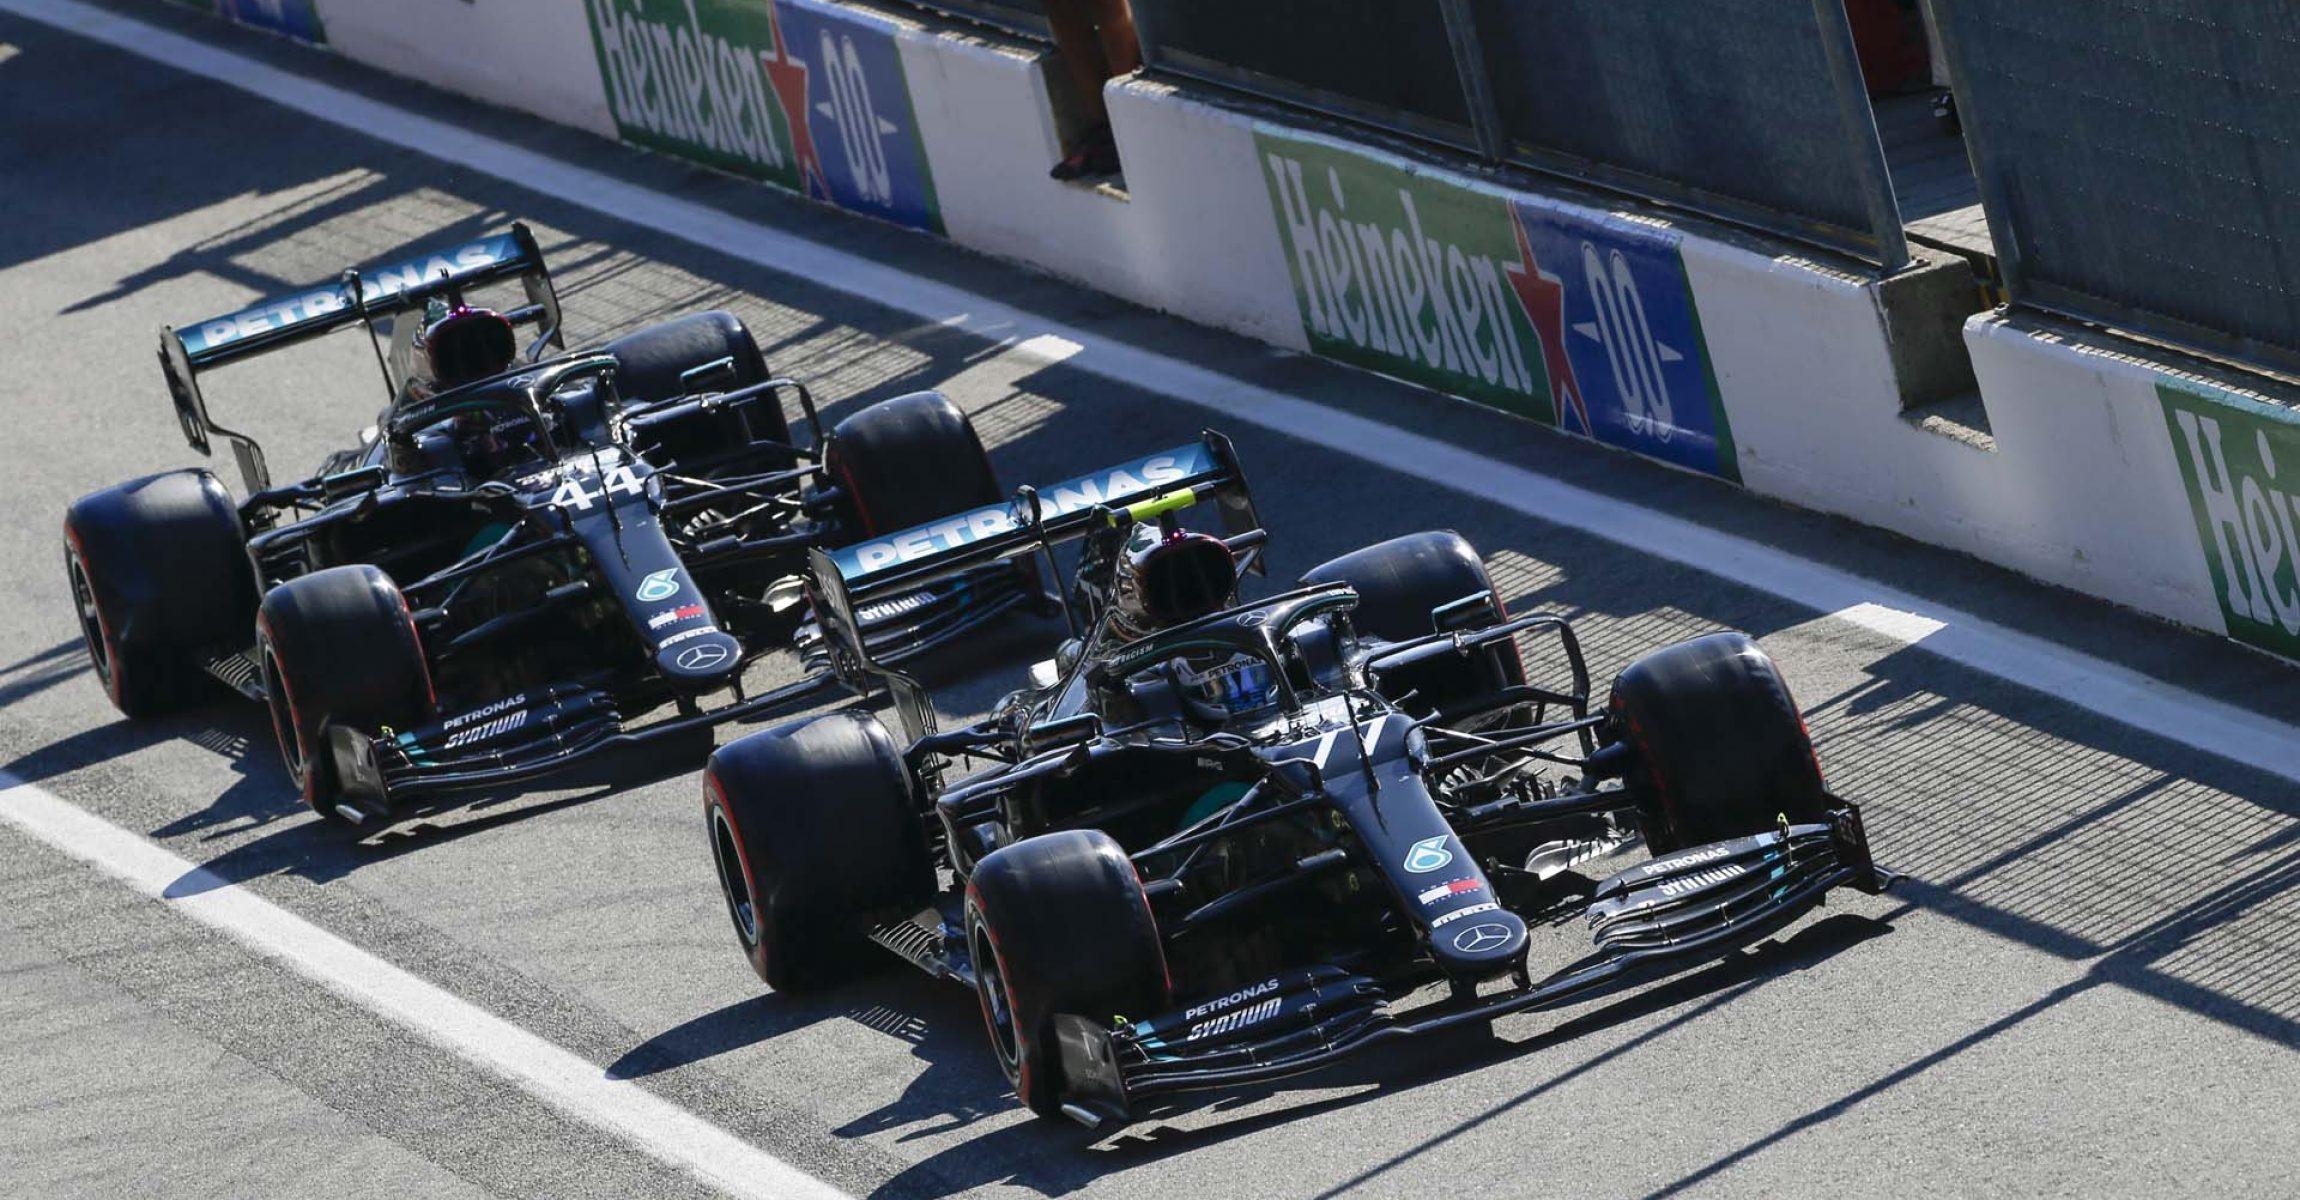 2020 Italian Grand Prix, Saturday - Wolfgang Wilhelm Valtteri Bottas Lewis Hamilton Mercedes